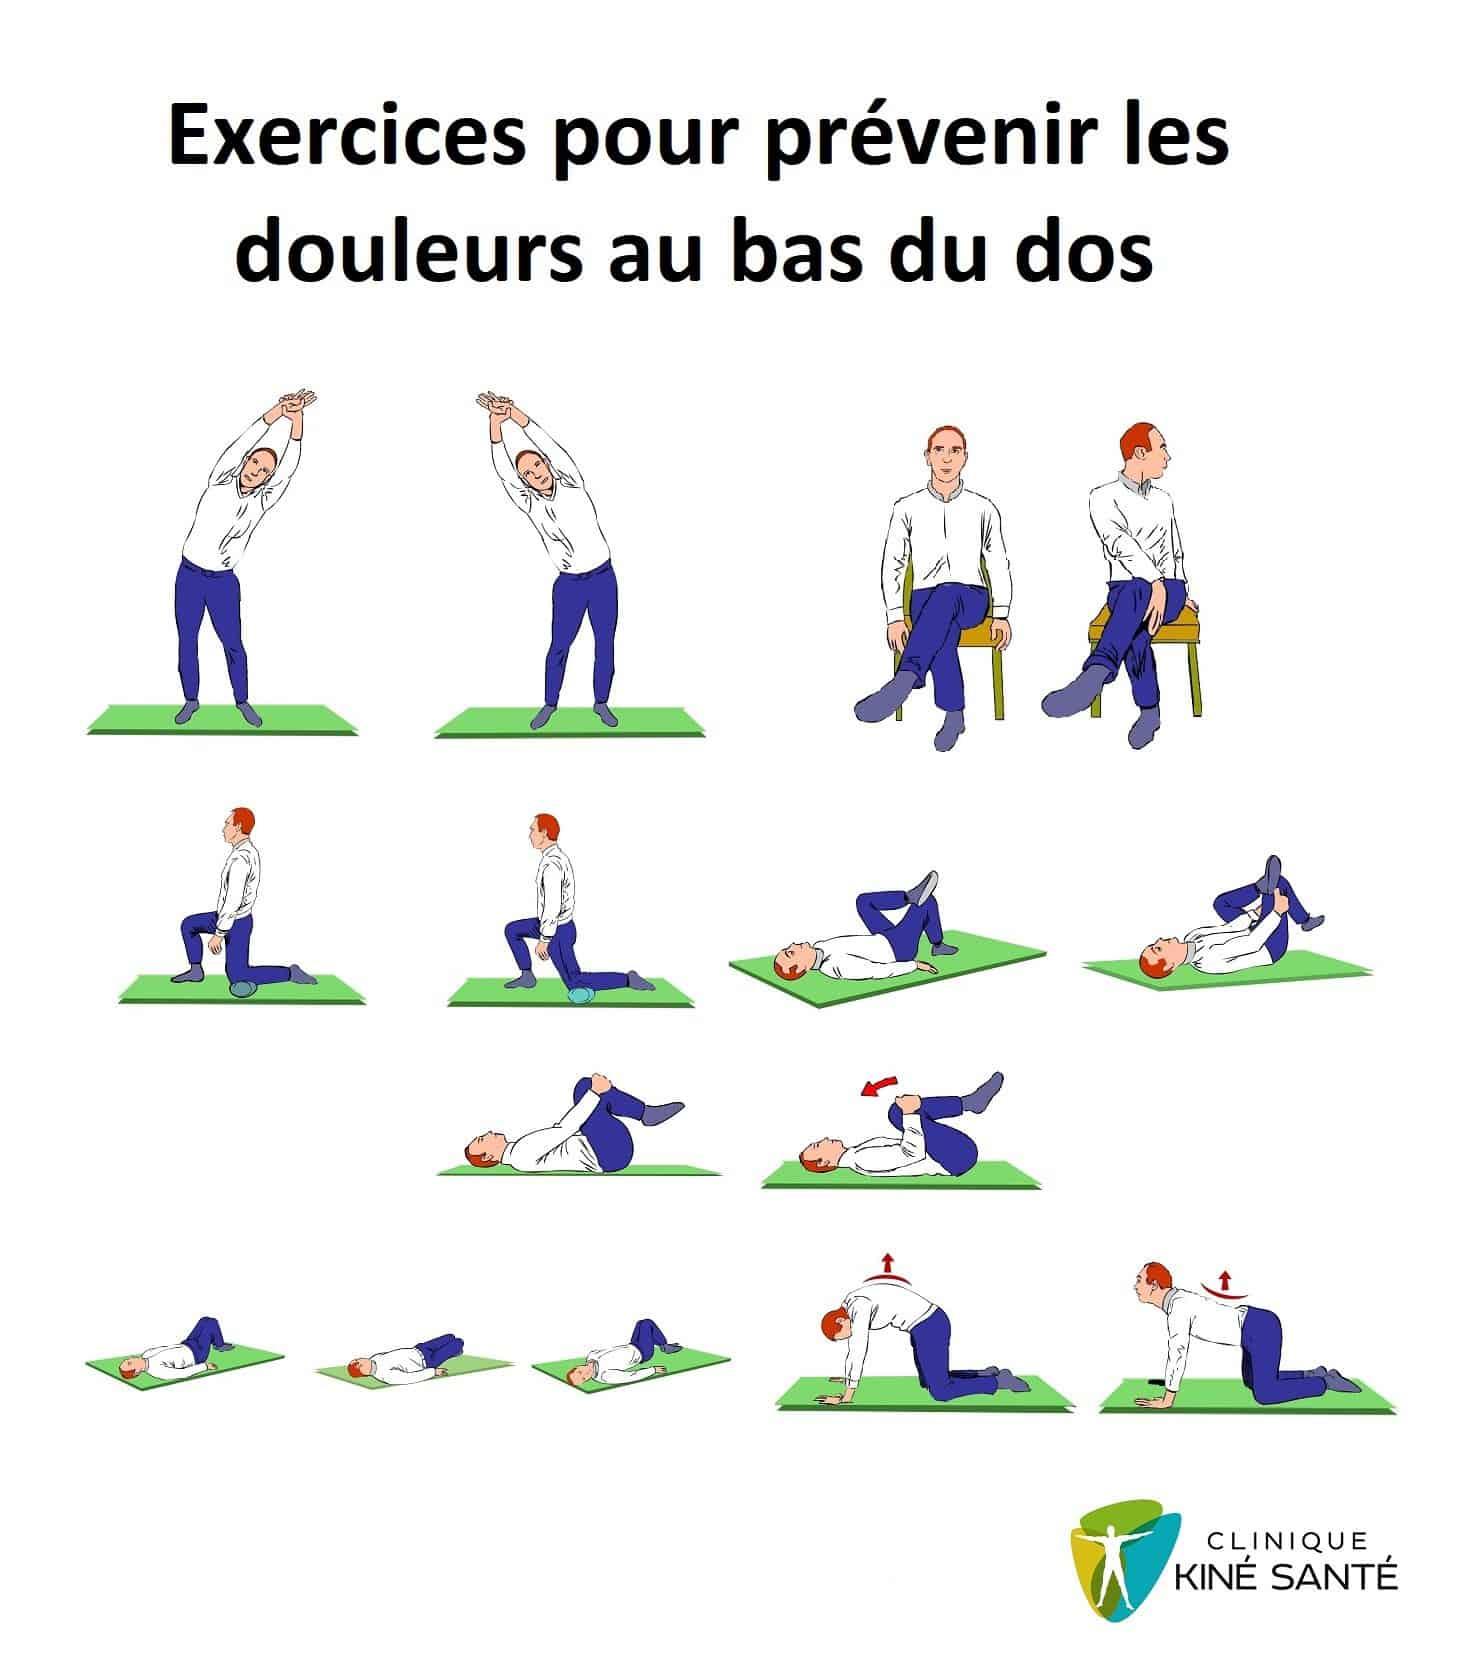 exercice - Photo